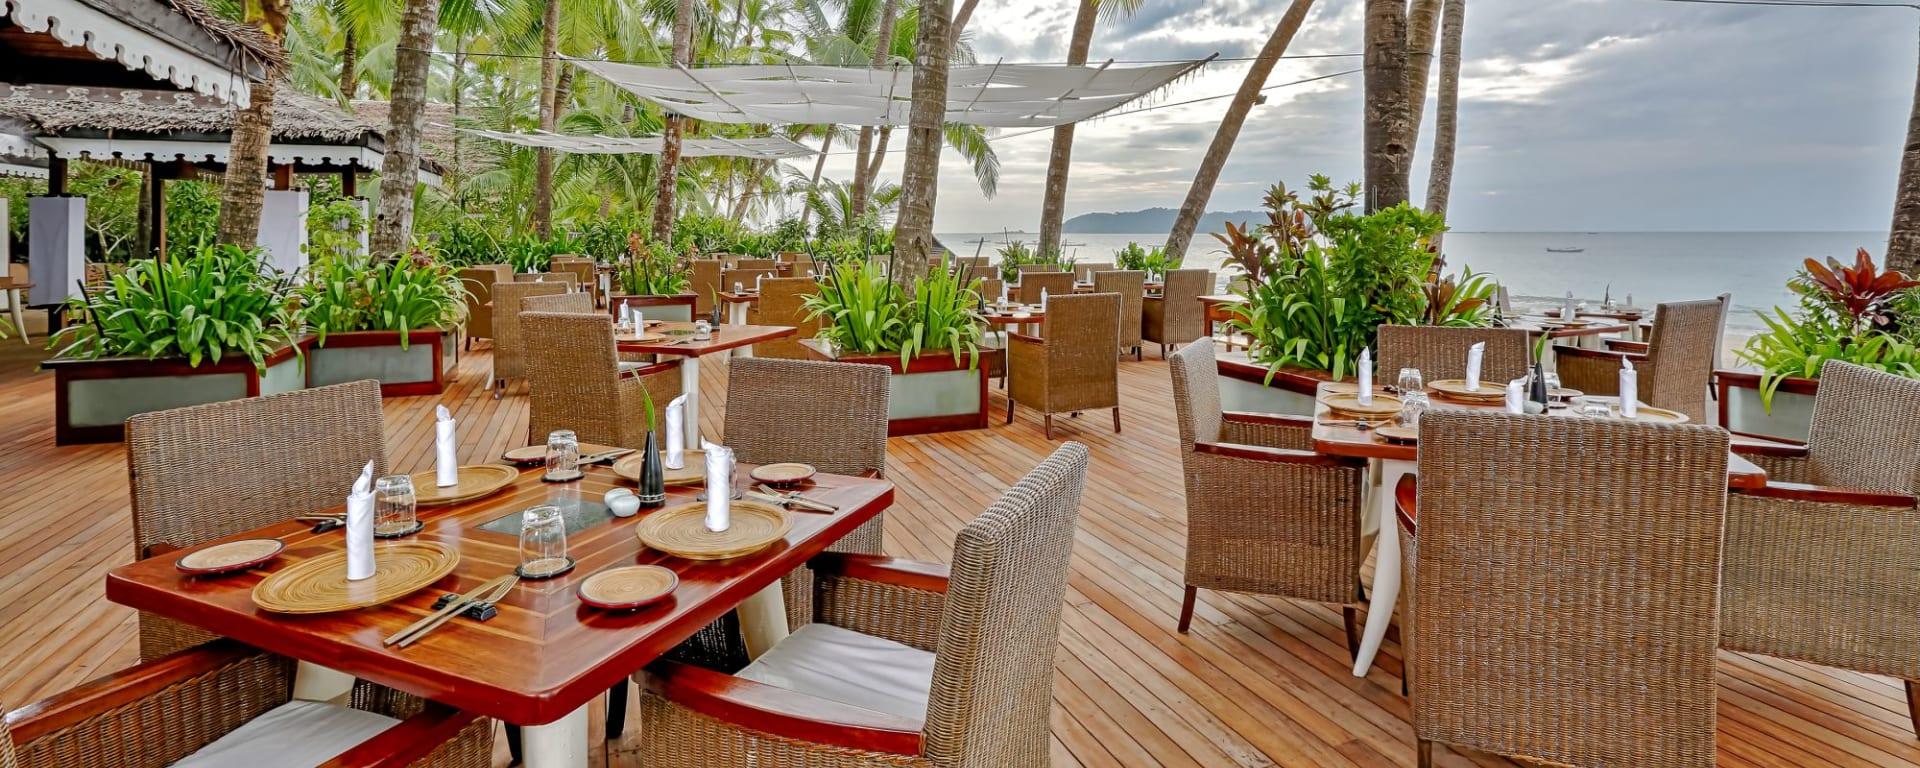 Sandoway Resort à Ngapali: Restaurant